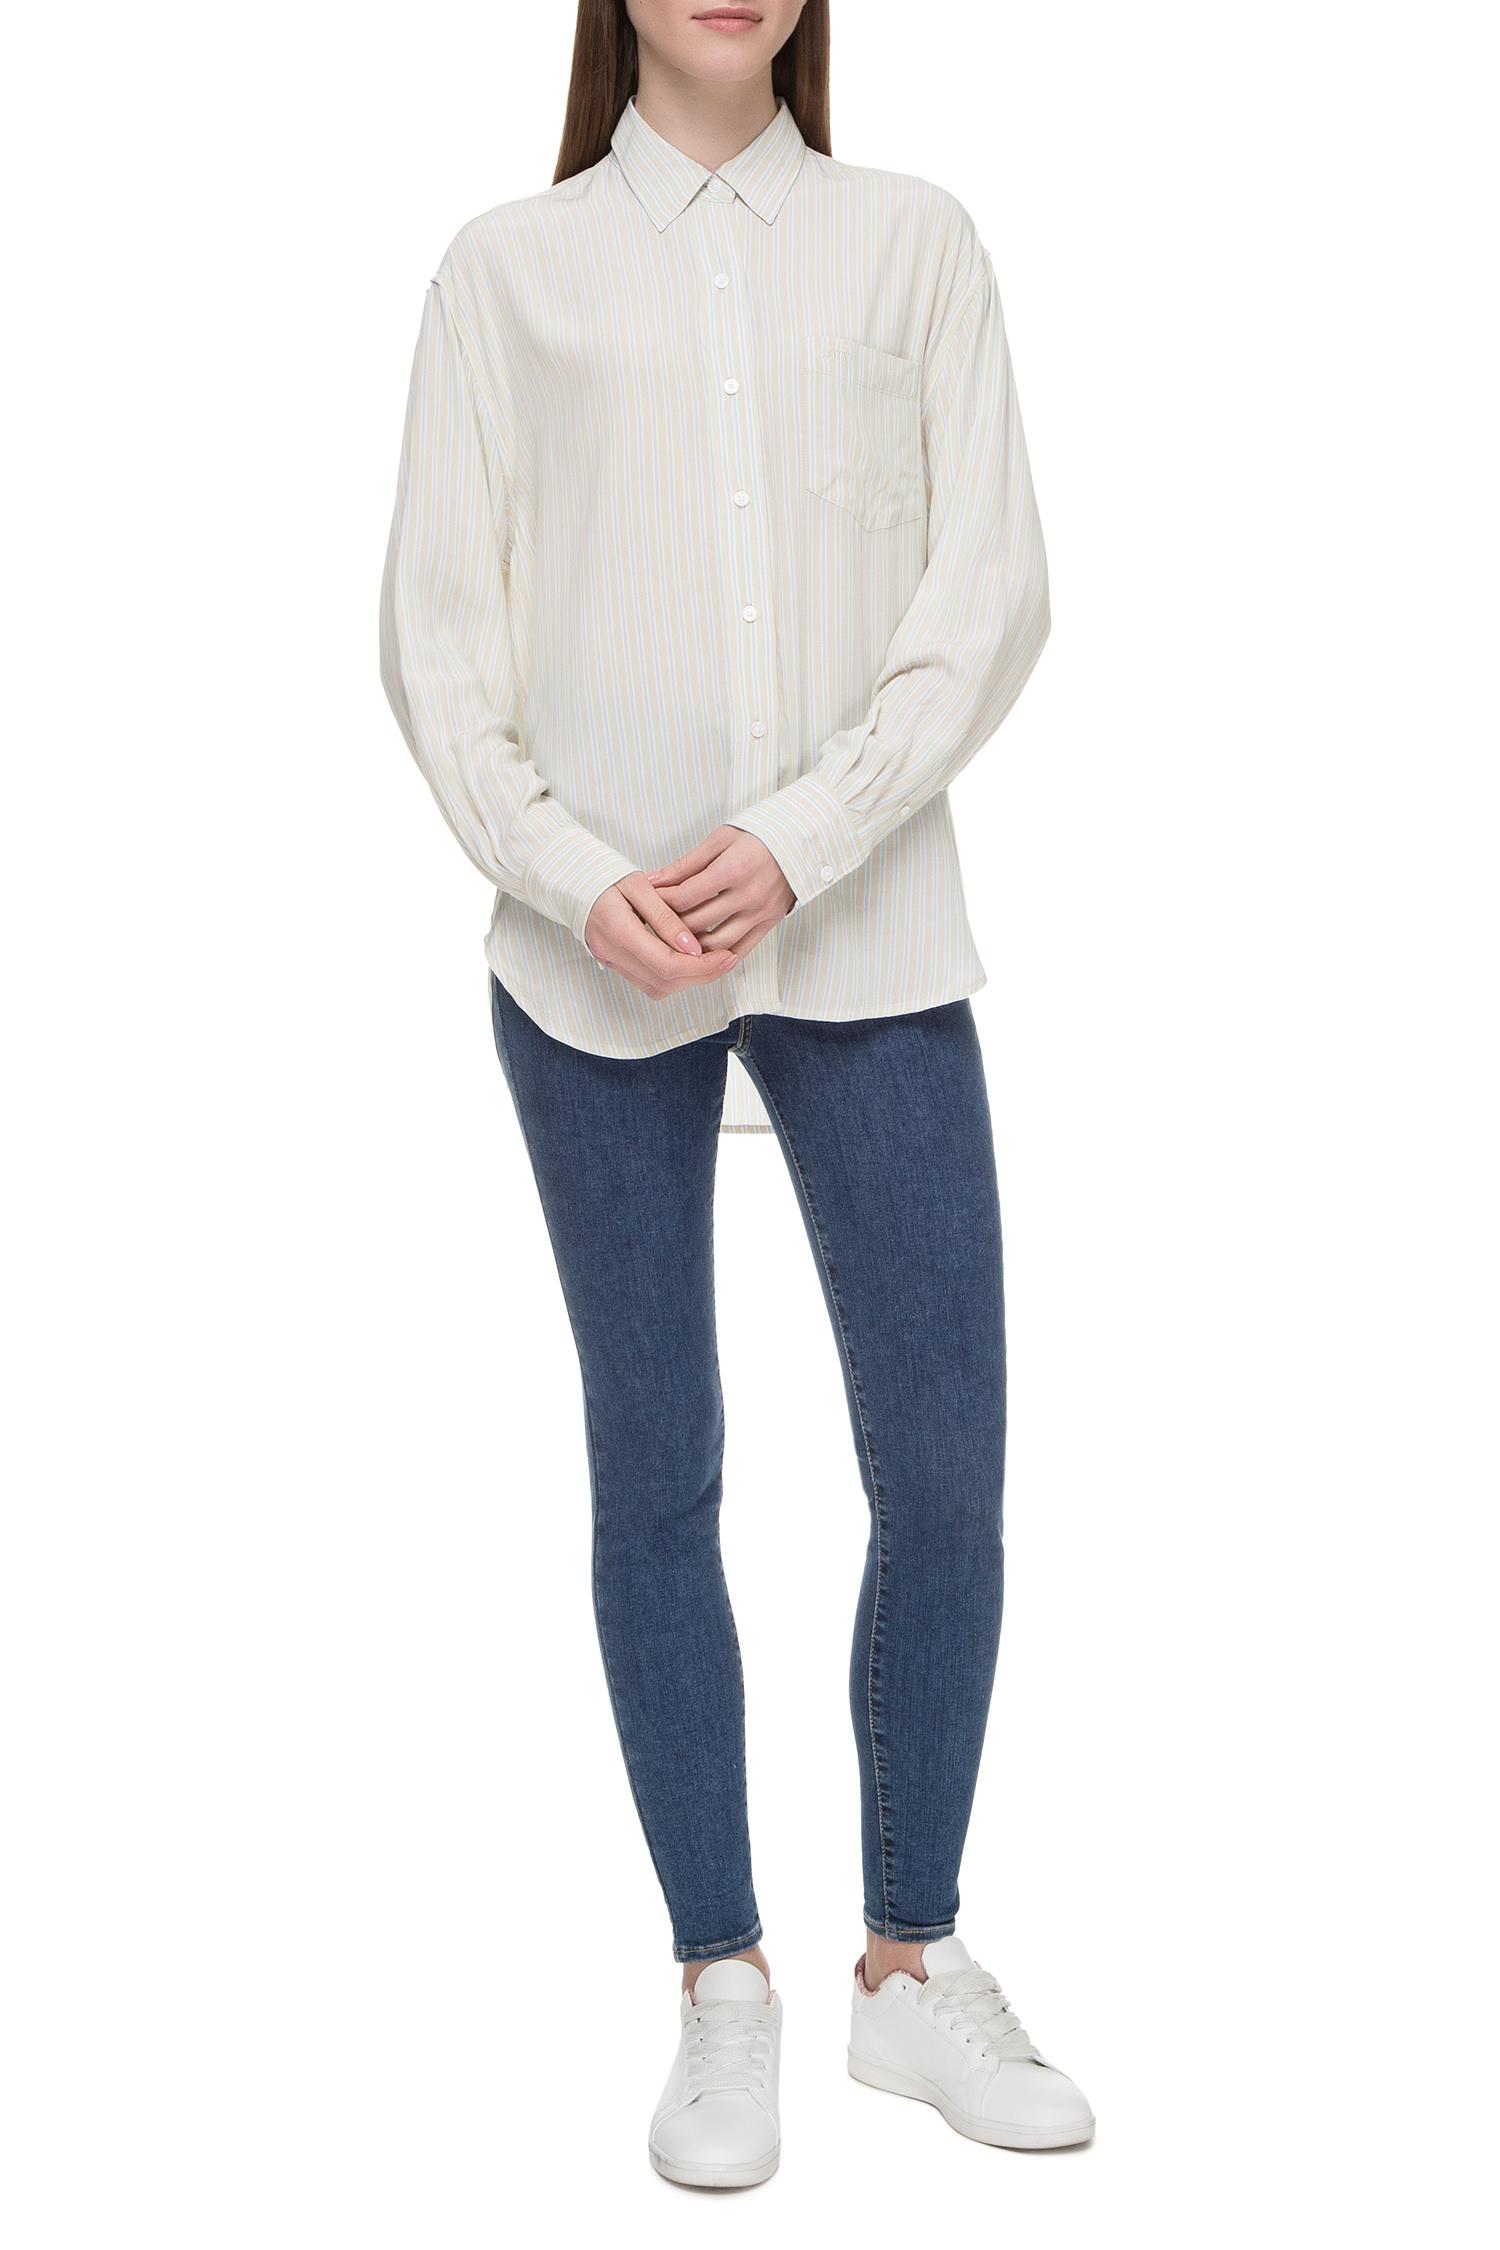 Жіноча сорочка у смужку Levis 85333;0011